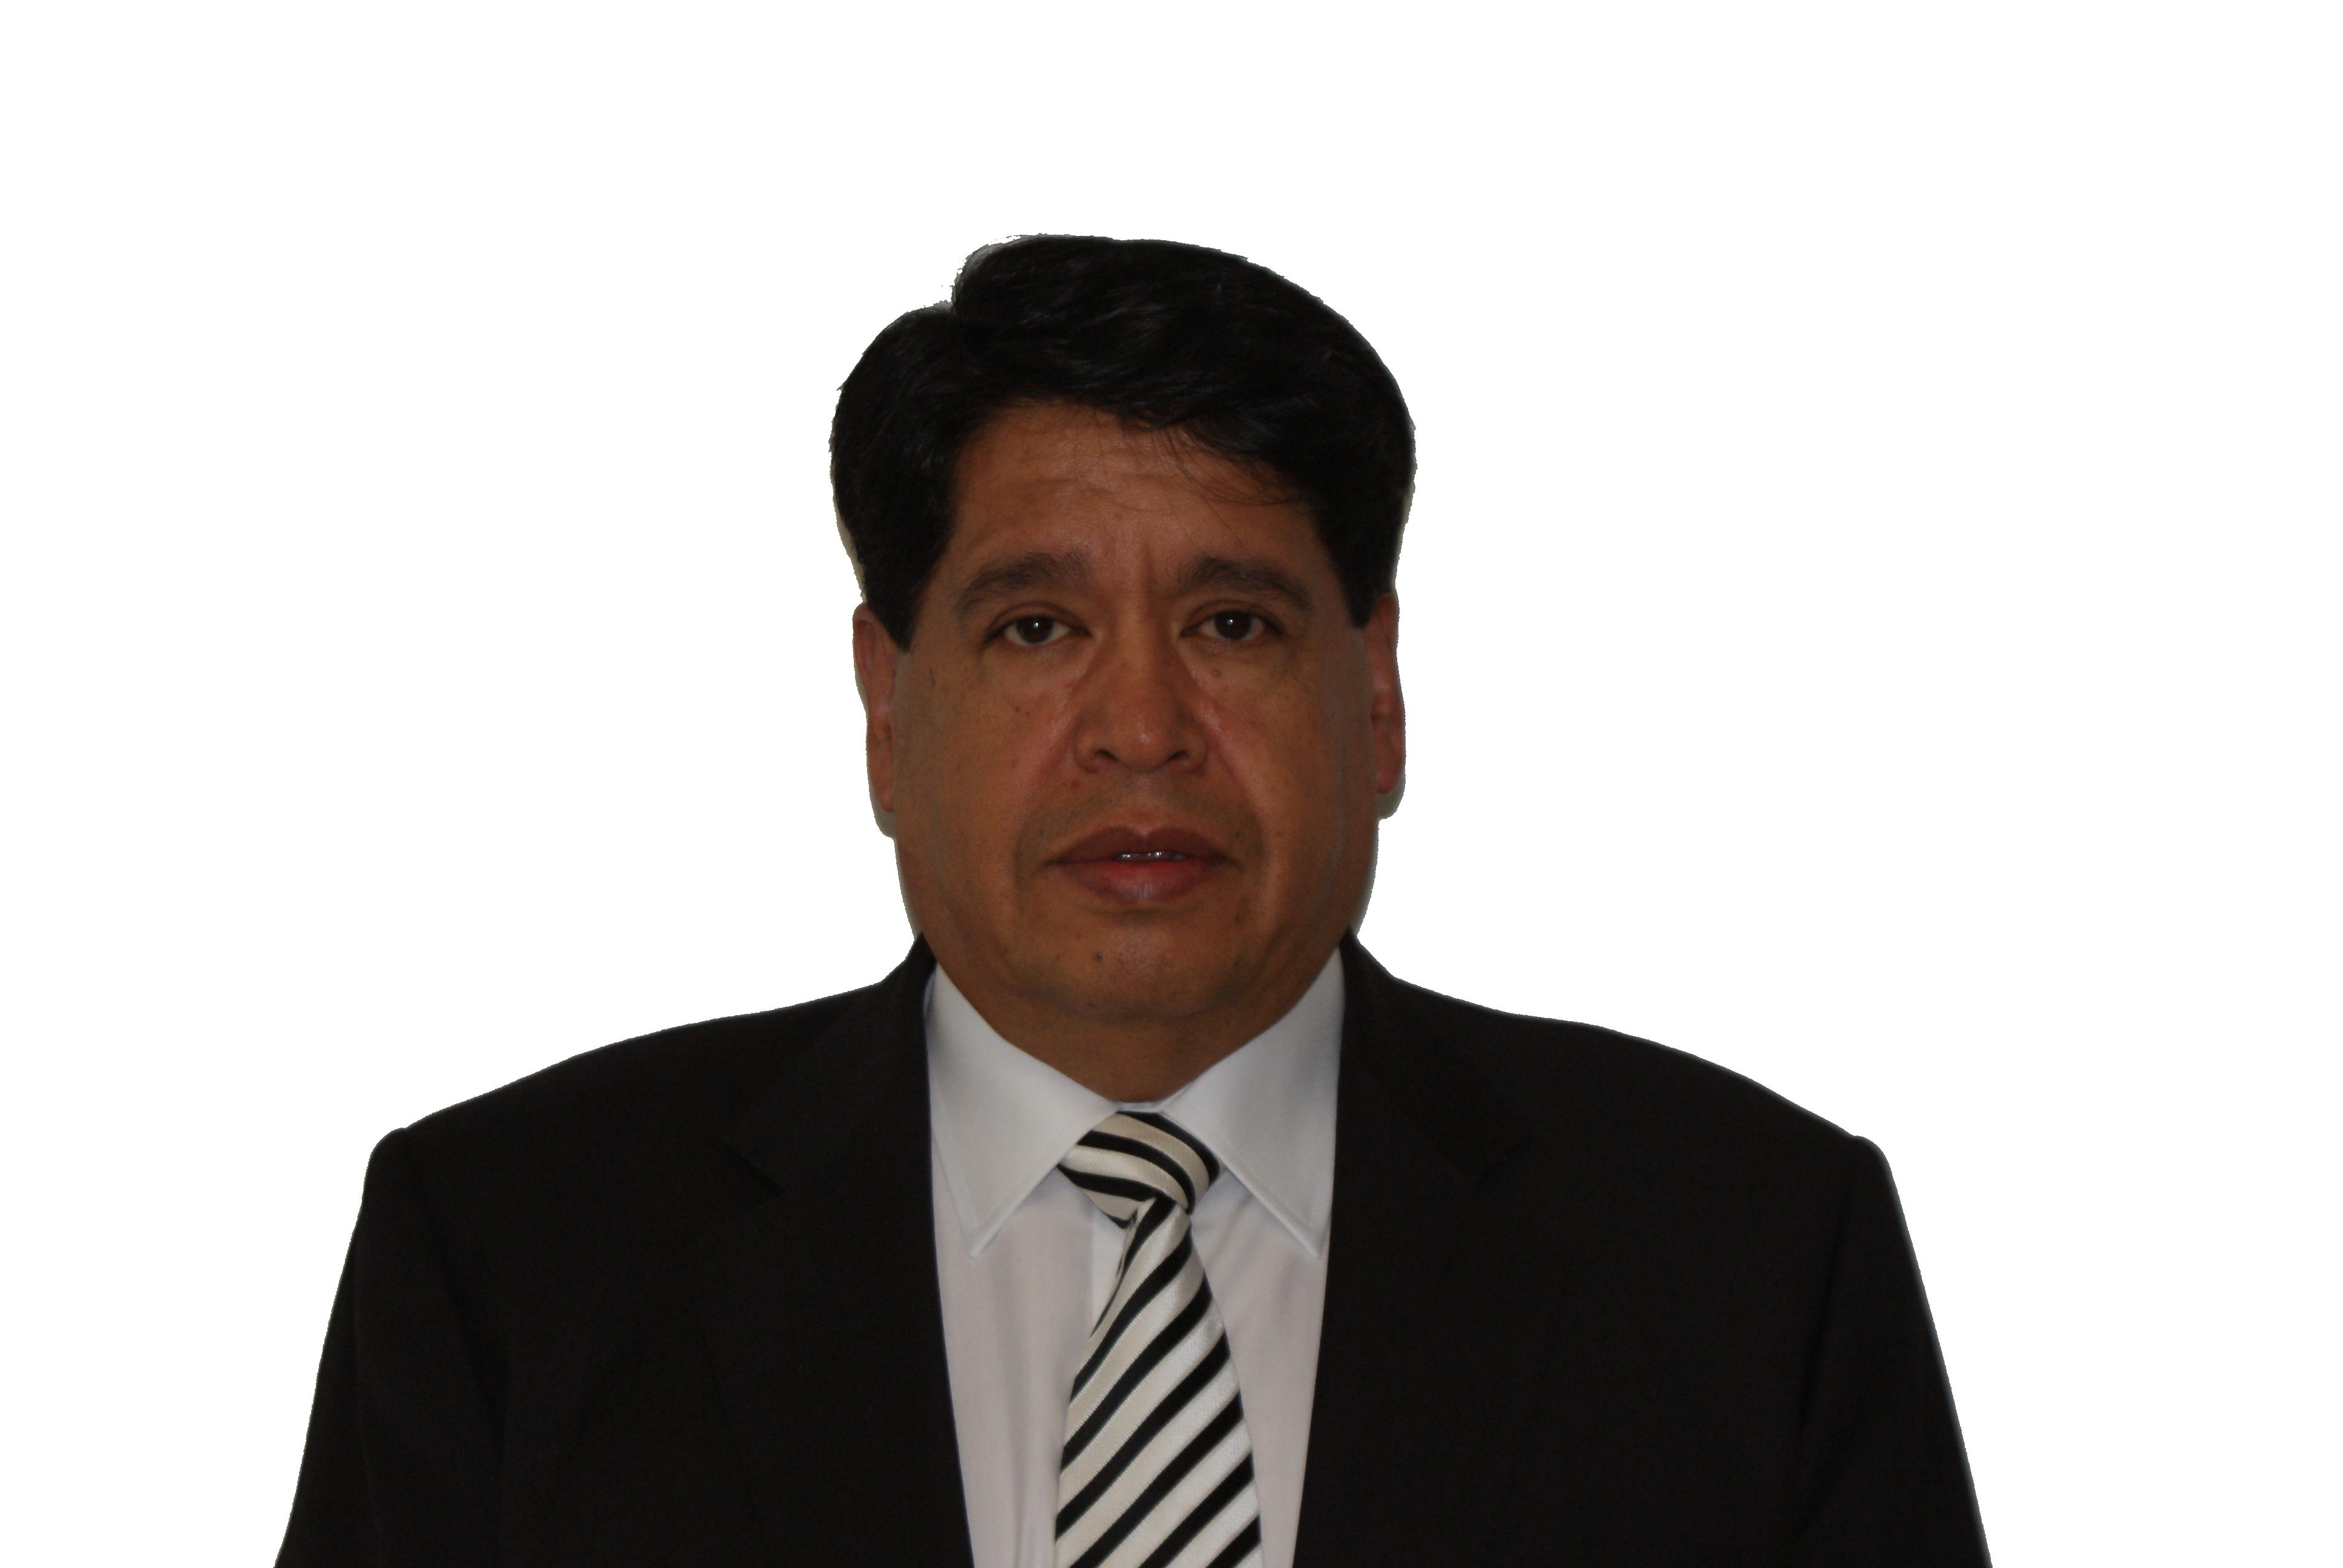 Sergio Alejandro Gómez Partida